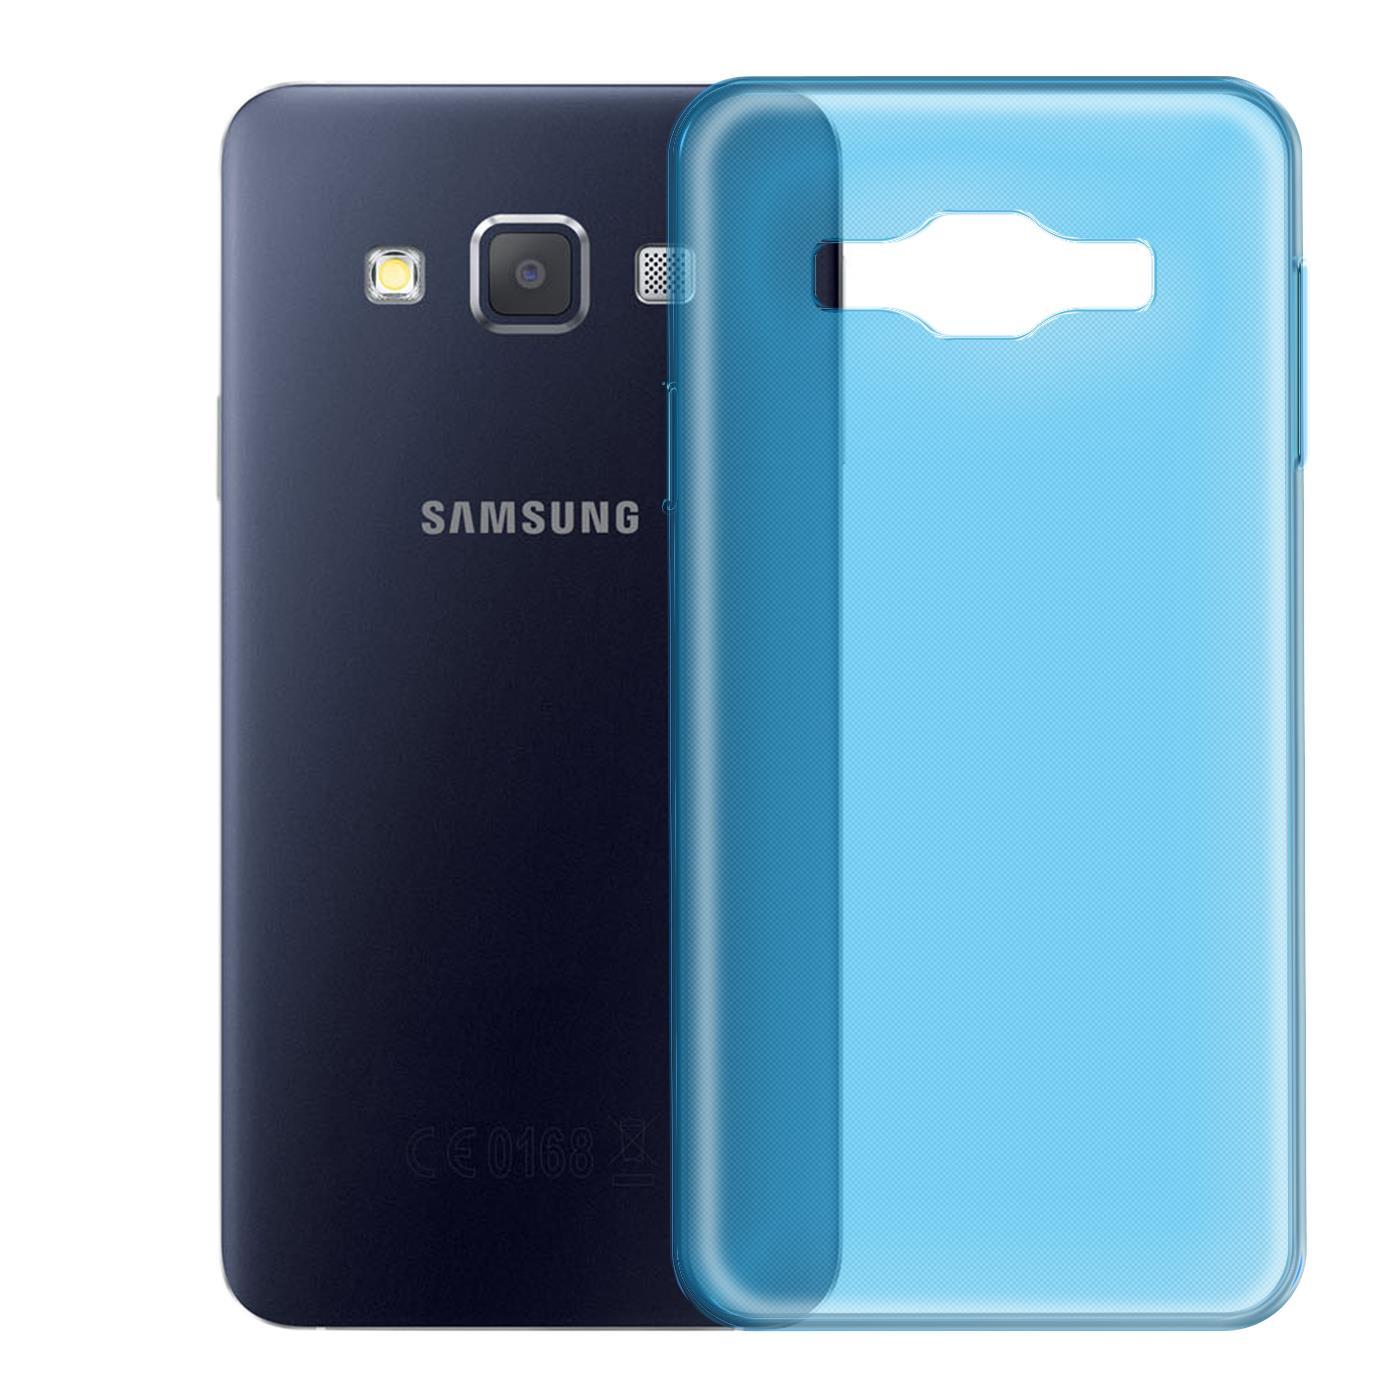 Samsung-Galaxy-A3-2015-Thin-Silicone-Clear-Case-Cover-Ultra-Slim-Shockproof-Gel Indexbild 6